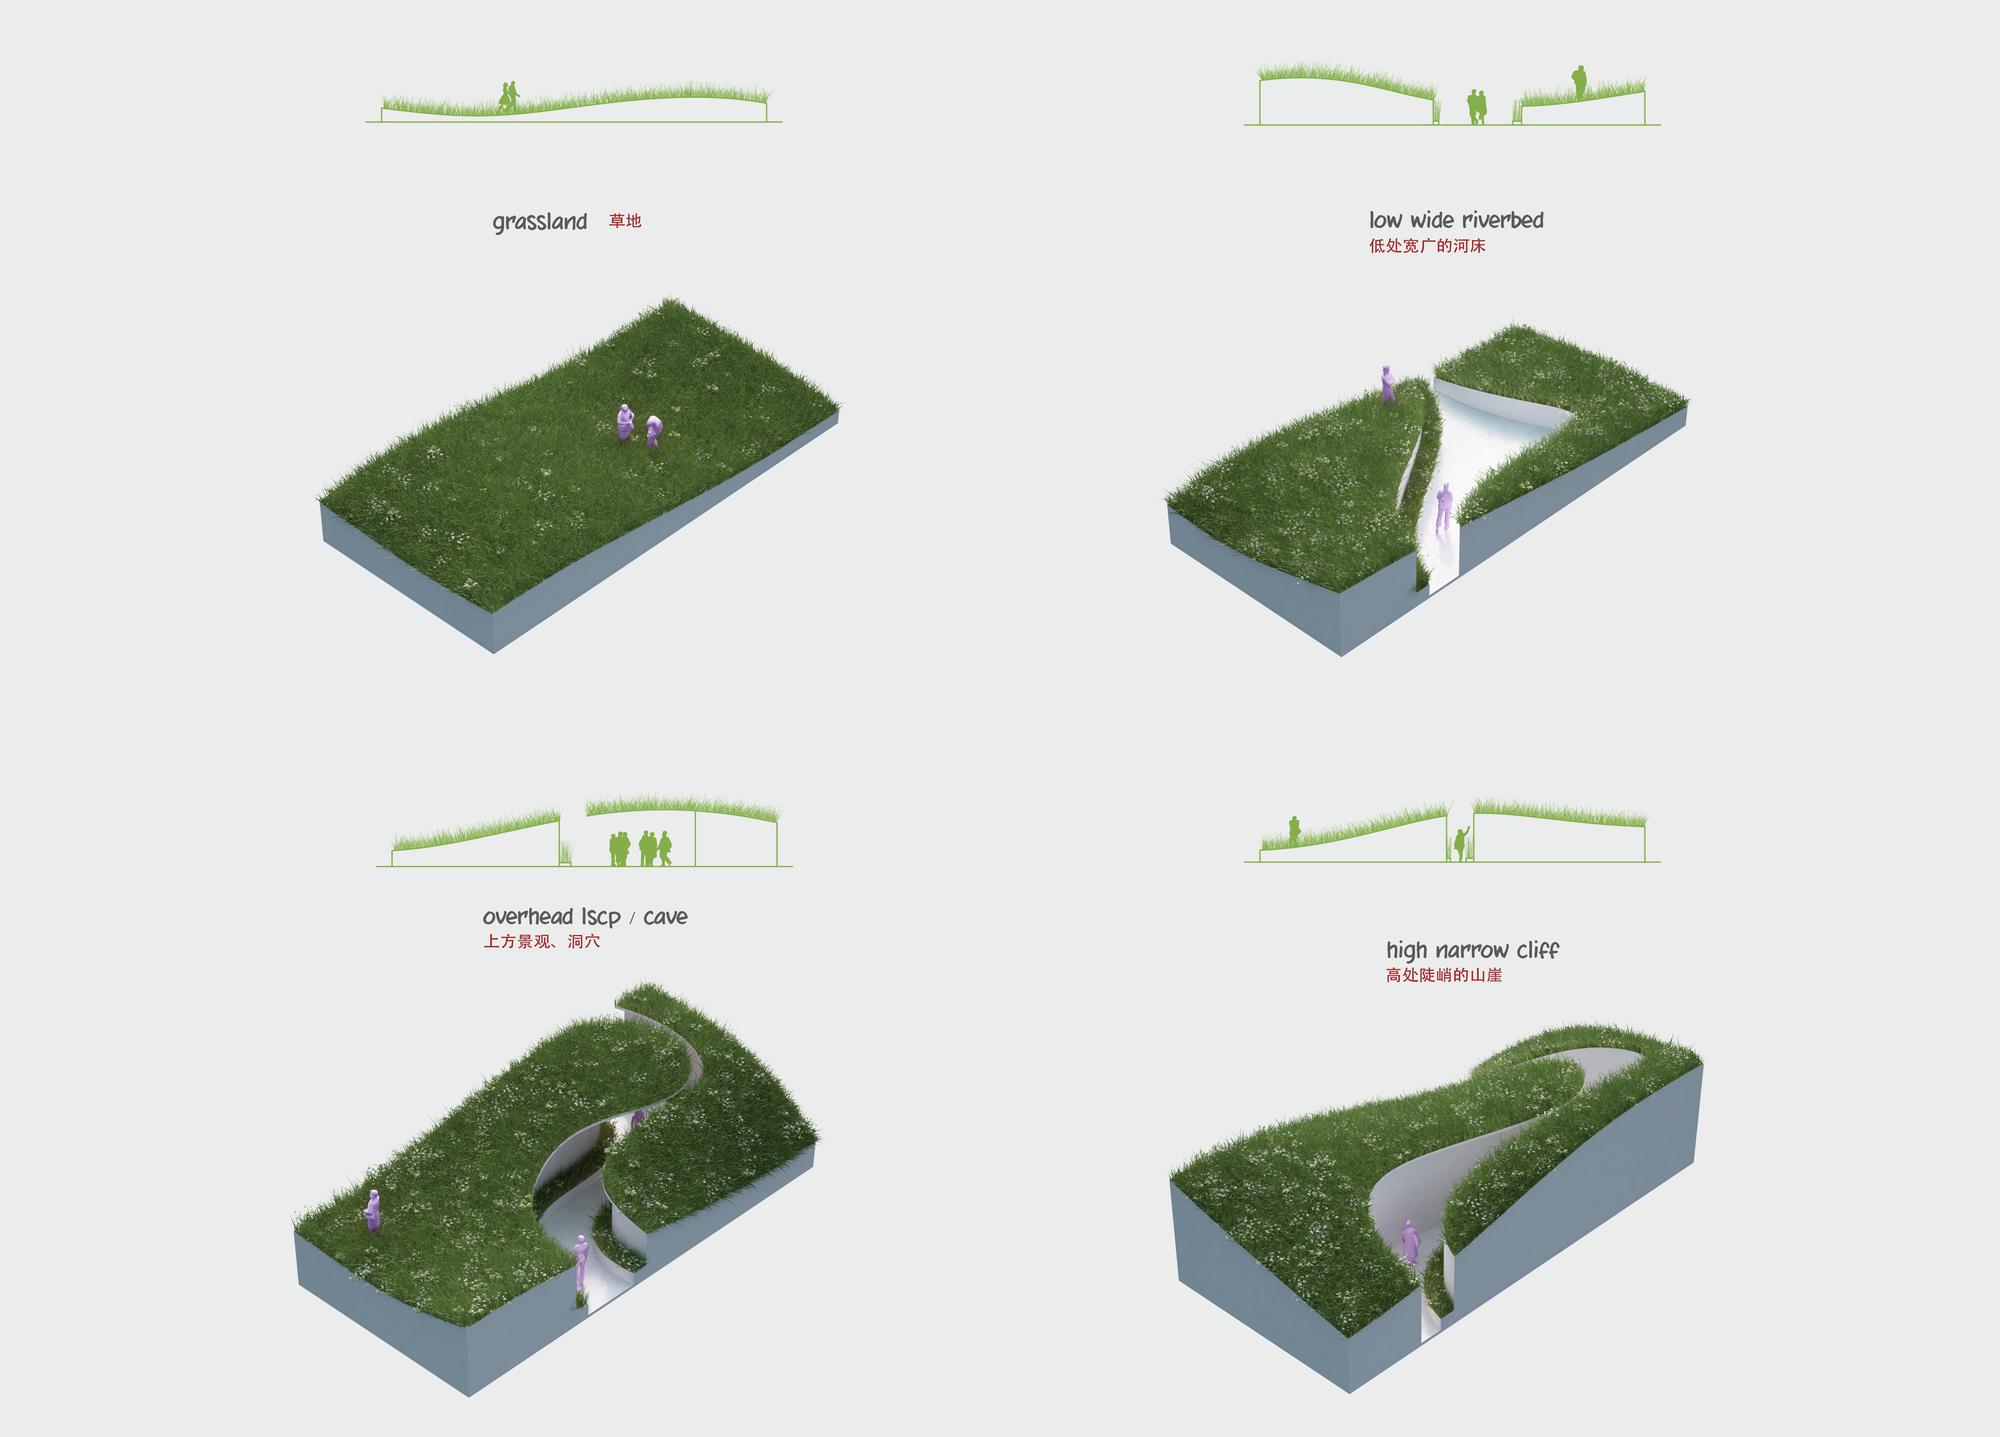 Gallery of Penda Designs River Inspired Landscape Pavilion